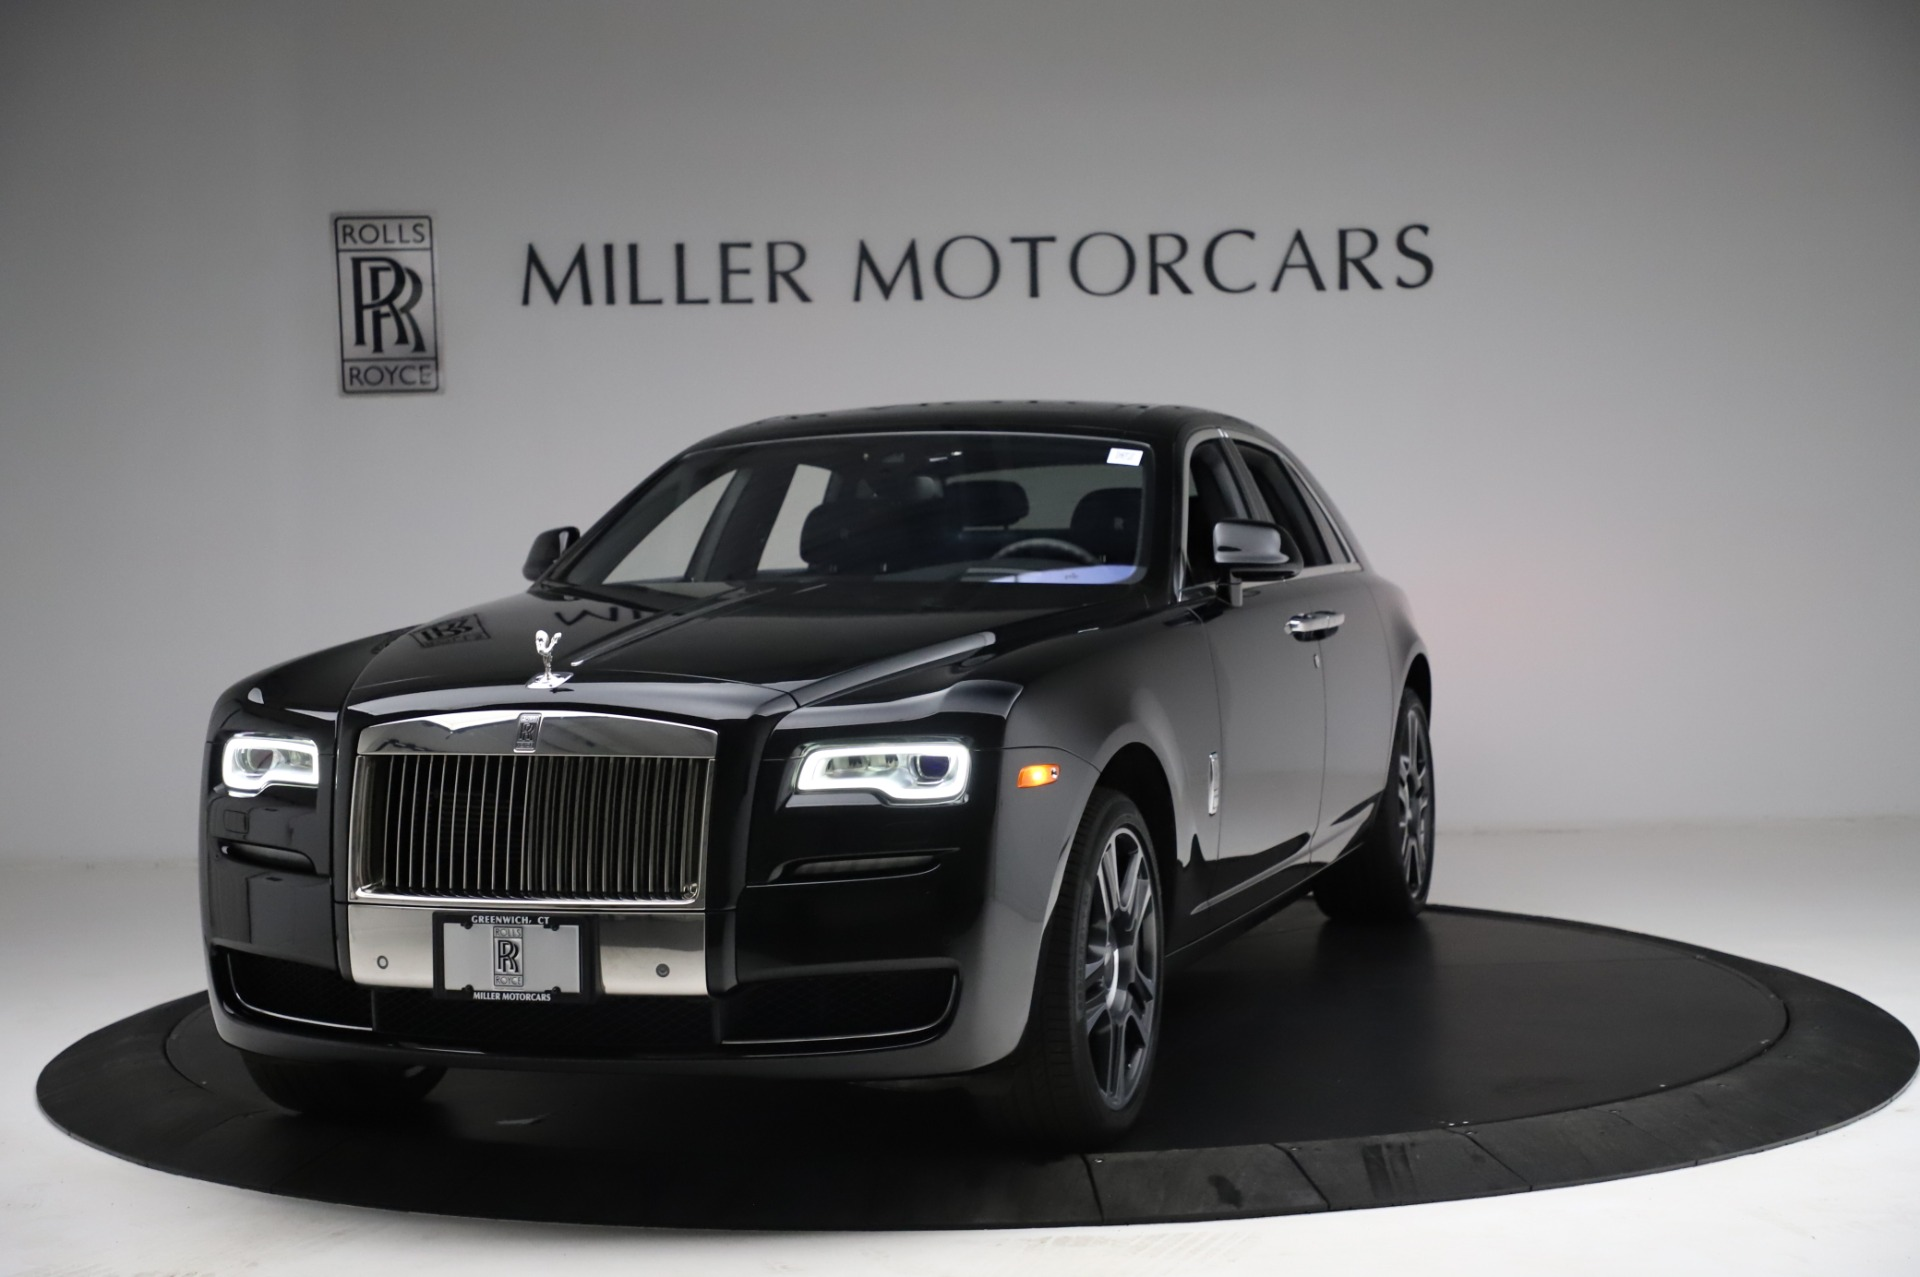 Used 2017 Rolls-Royce Ghost for sale $209,900 at Rolls-Royce Motor Cars Greenwich in Greenwich CT 06830 1